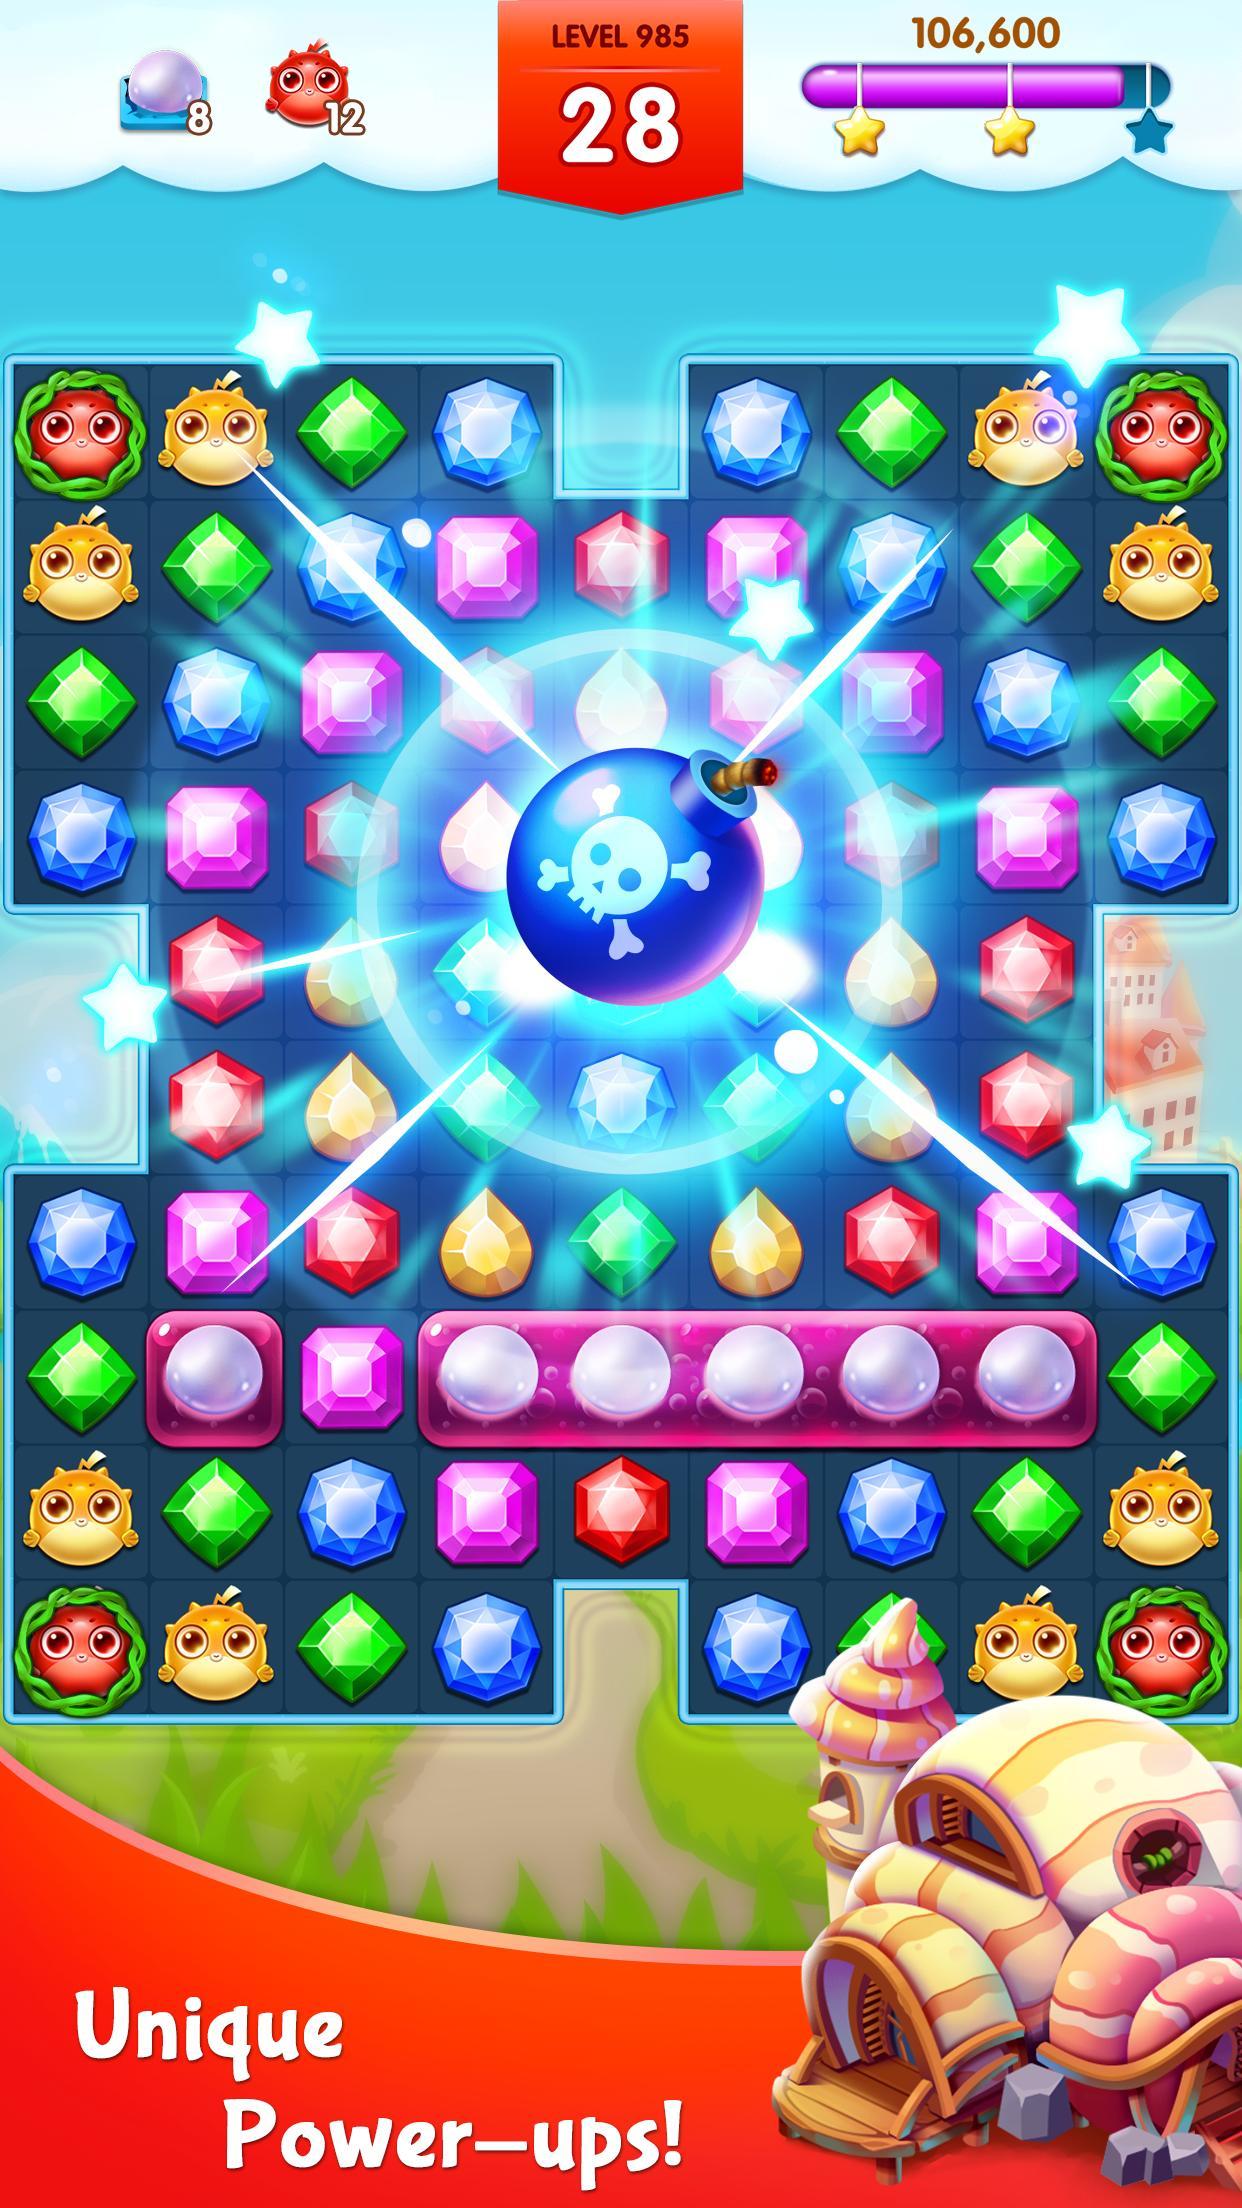 Jewels Legend - Match 3 Puzzle 2.33.3 Screenshot 17